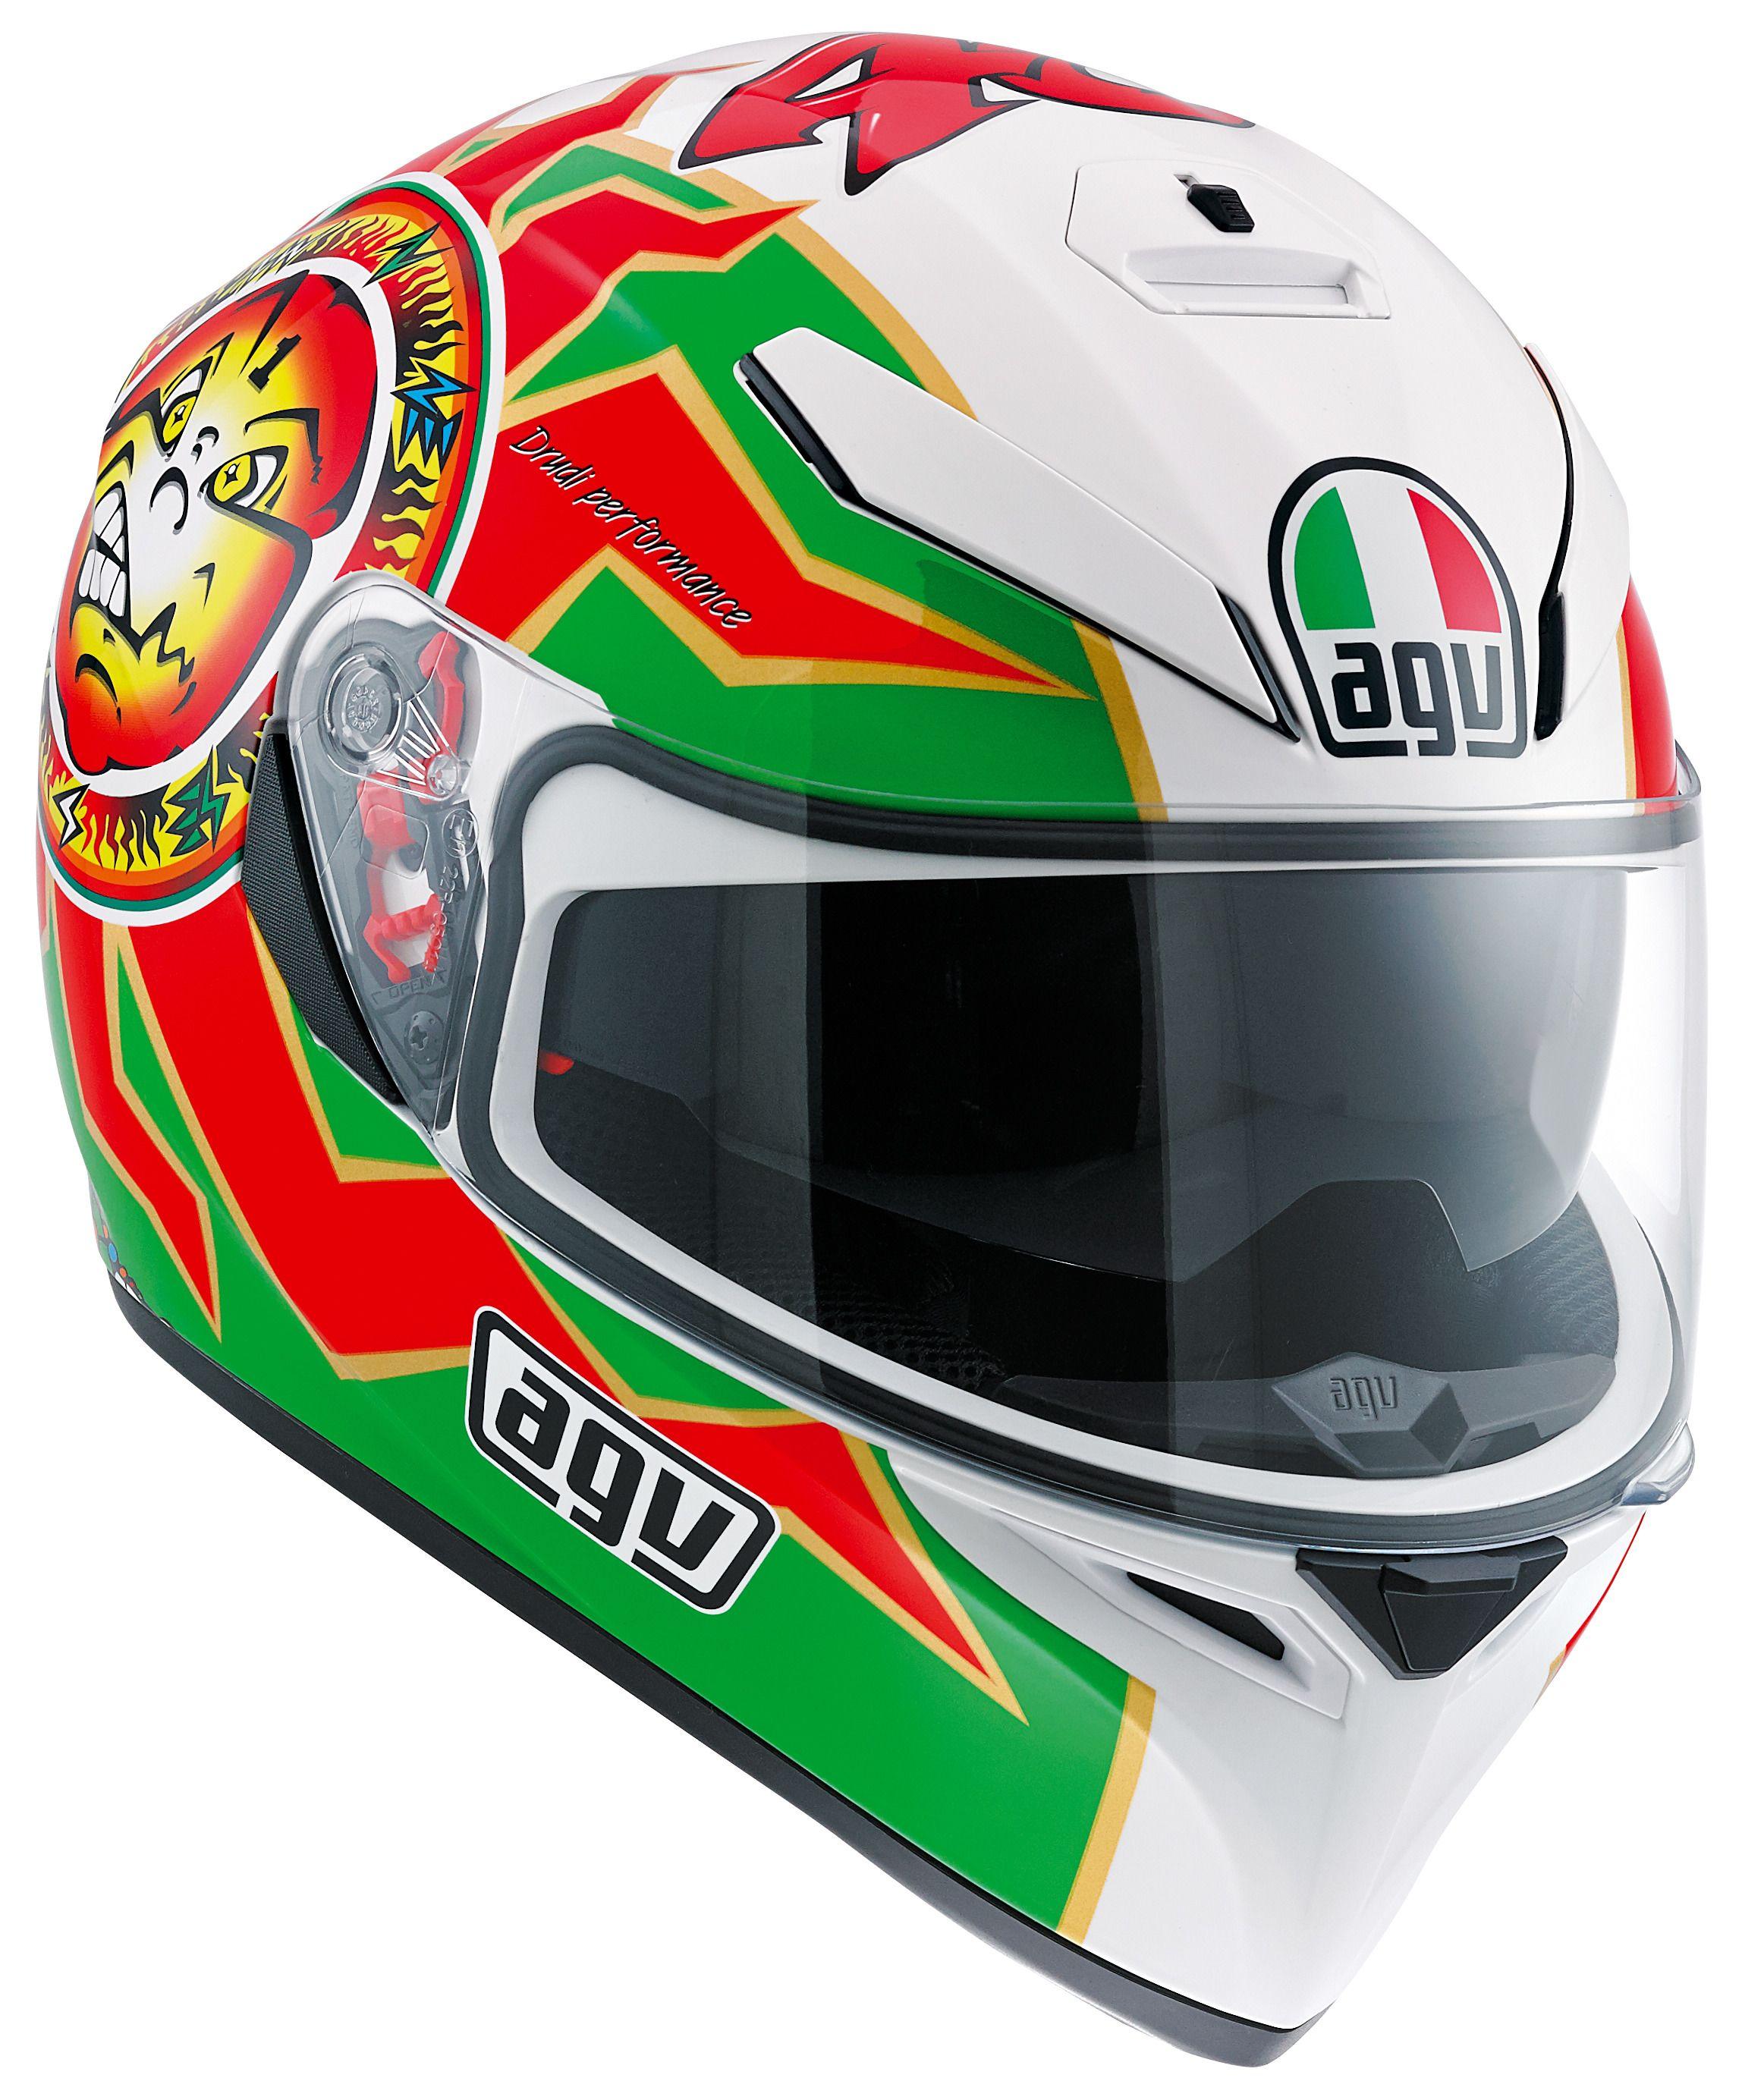 Agv K3 Sv Imola 1998 Helmet Size Xs Only 40 10798 Off Visor Helm Revzilla